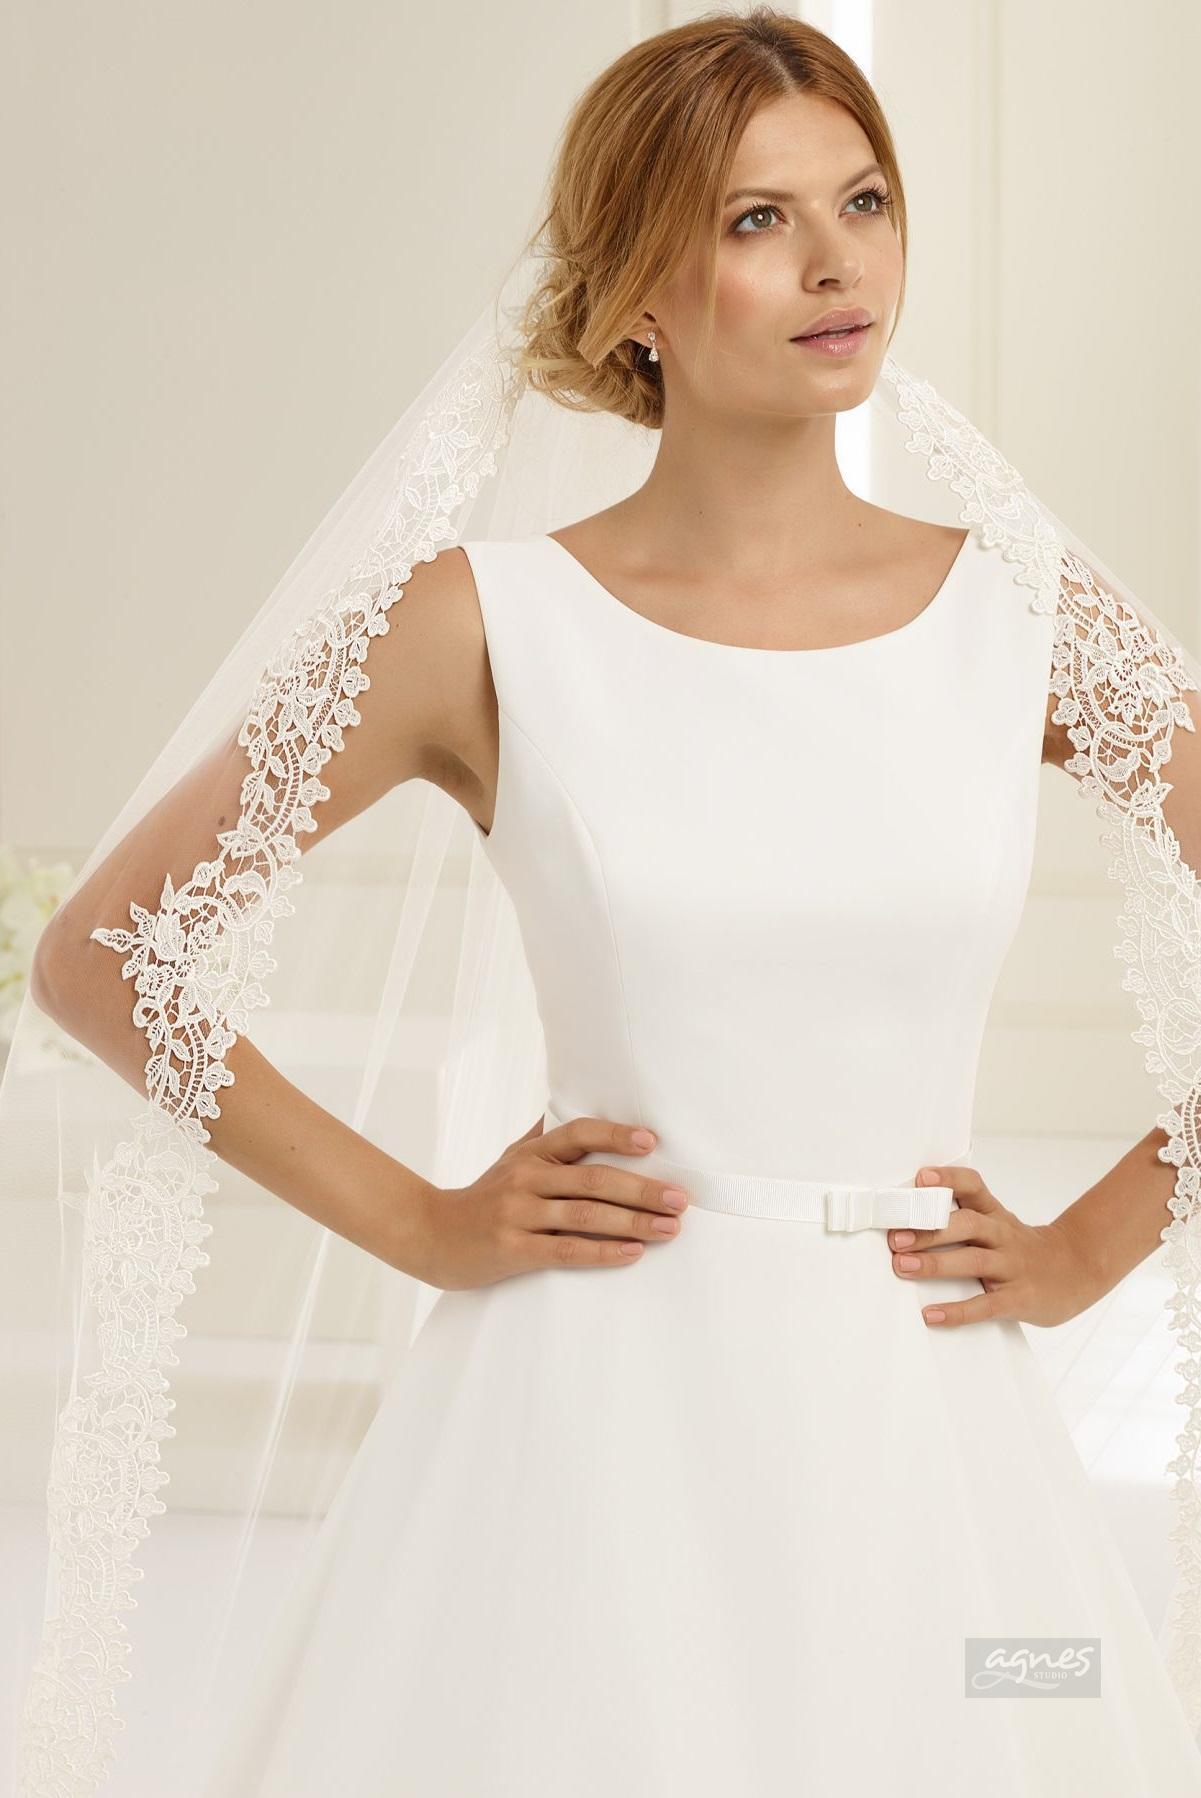 IMPERIA (2)-Bianco-Evento-bridal-dress-studioagnes